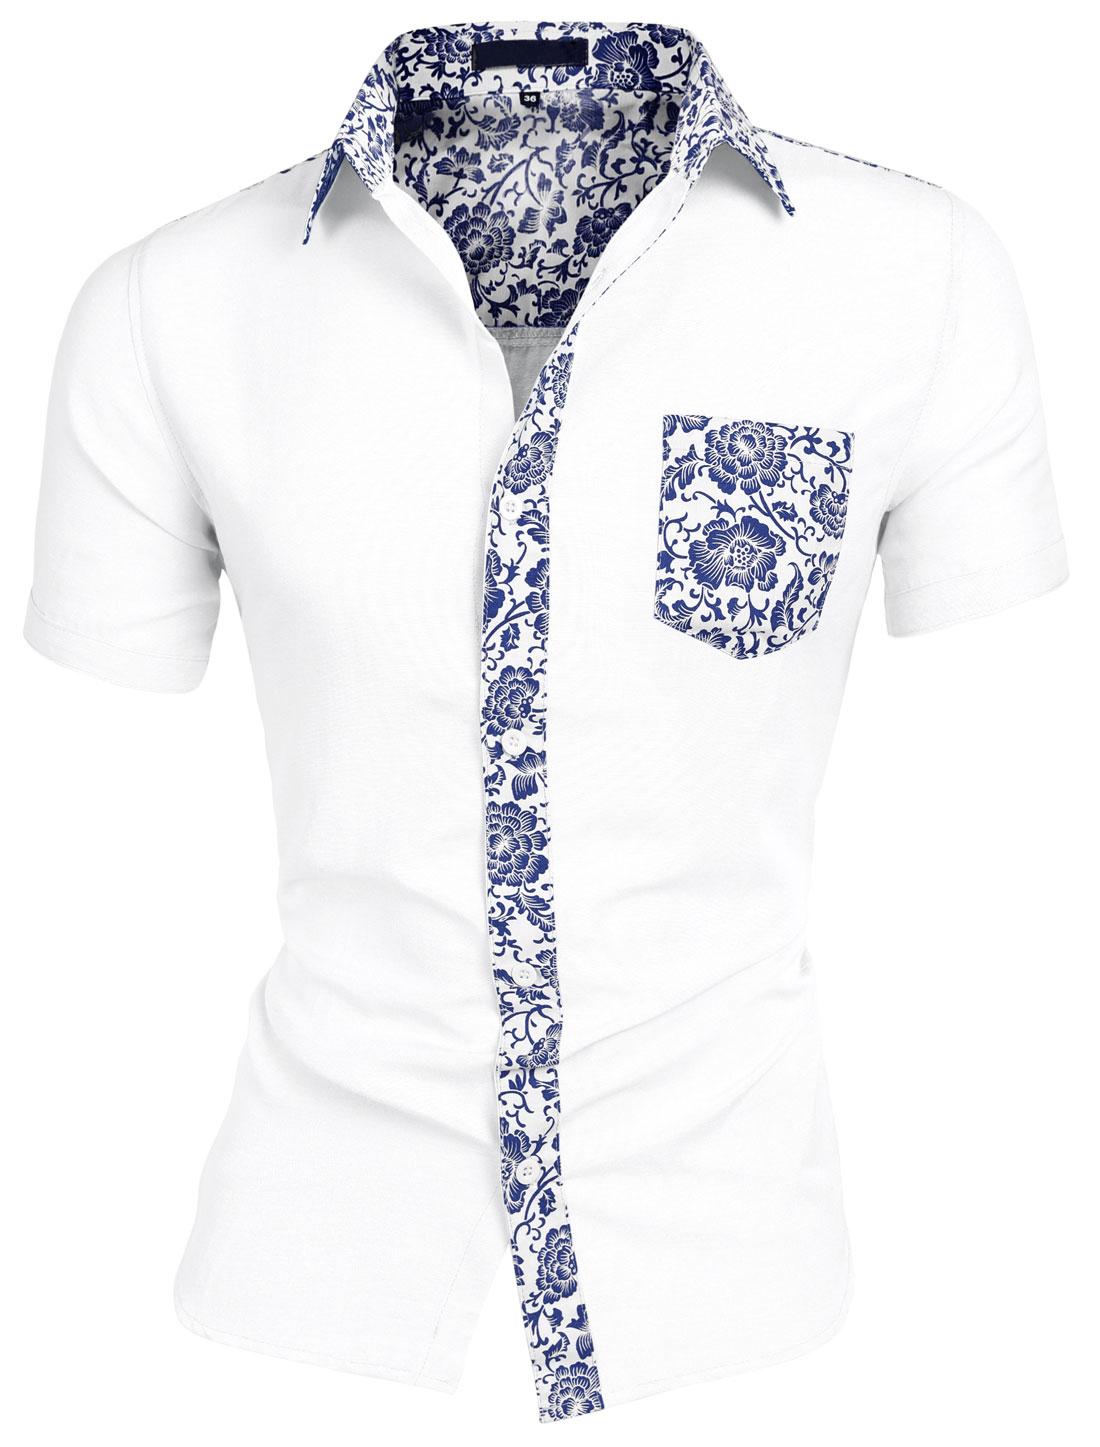 Men Floral Pocket Short Sleeve Button Down Casual Hawaiian Shirt Navy White L